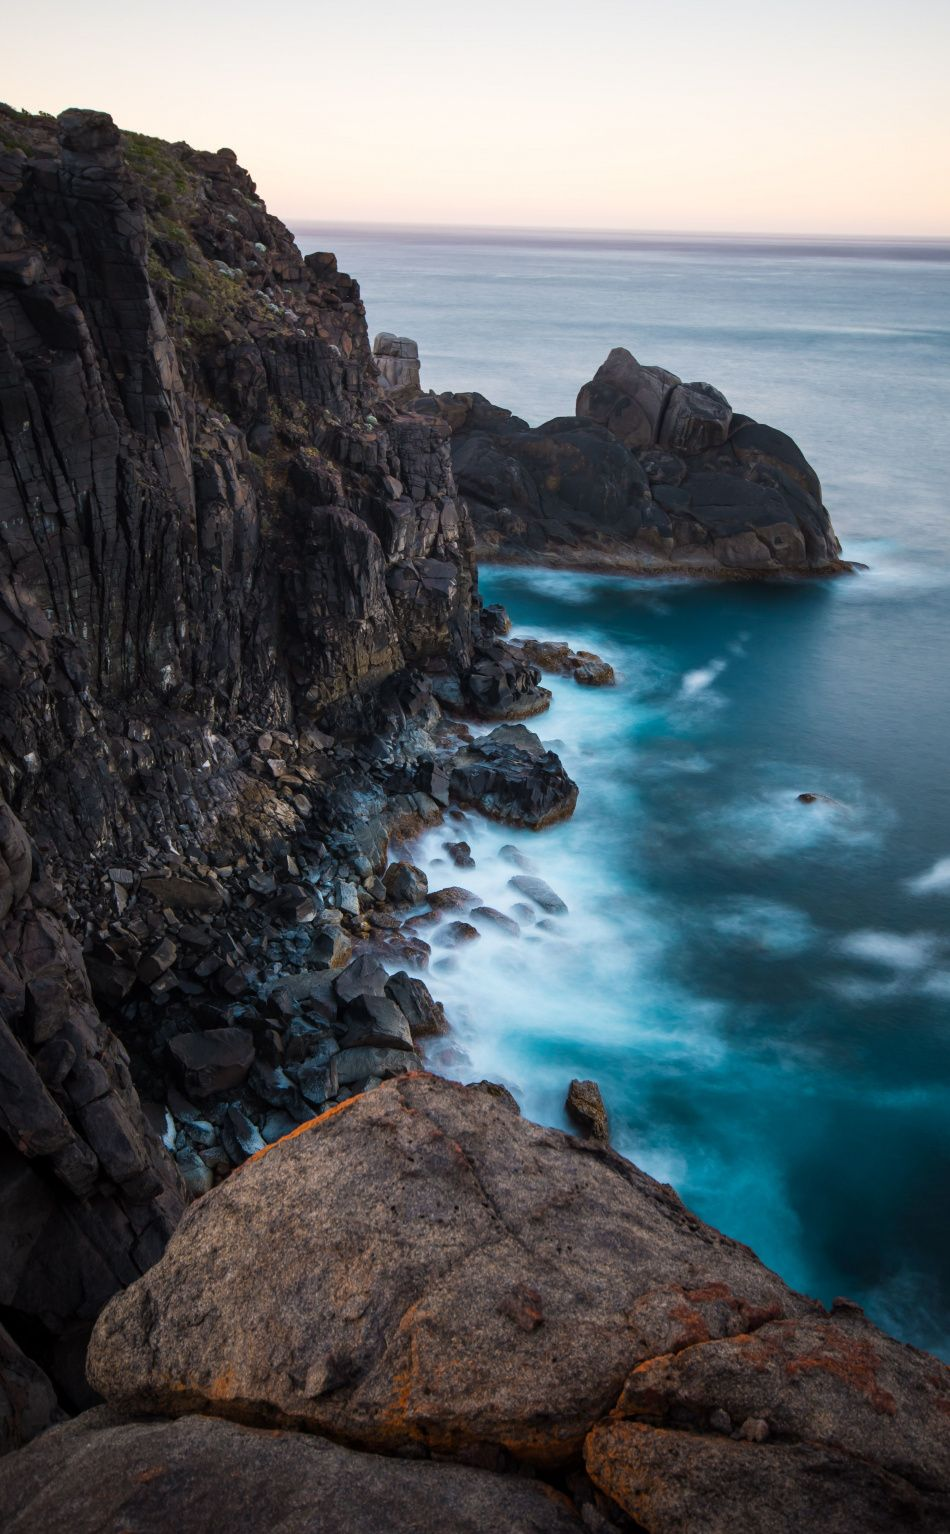 Coast Blue Sea Rocks Adorable Nature 950x1534 Wallpaper Nature Water Rock Photography Ocean Shores Hd wallpaper sea coast mountains rocks